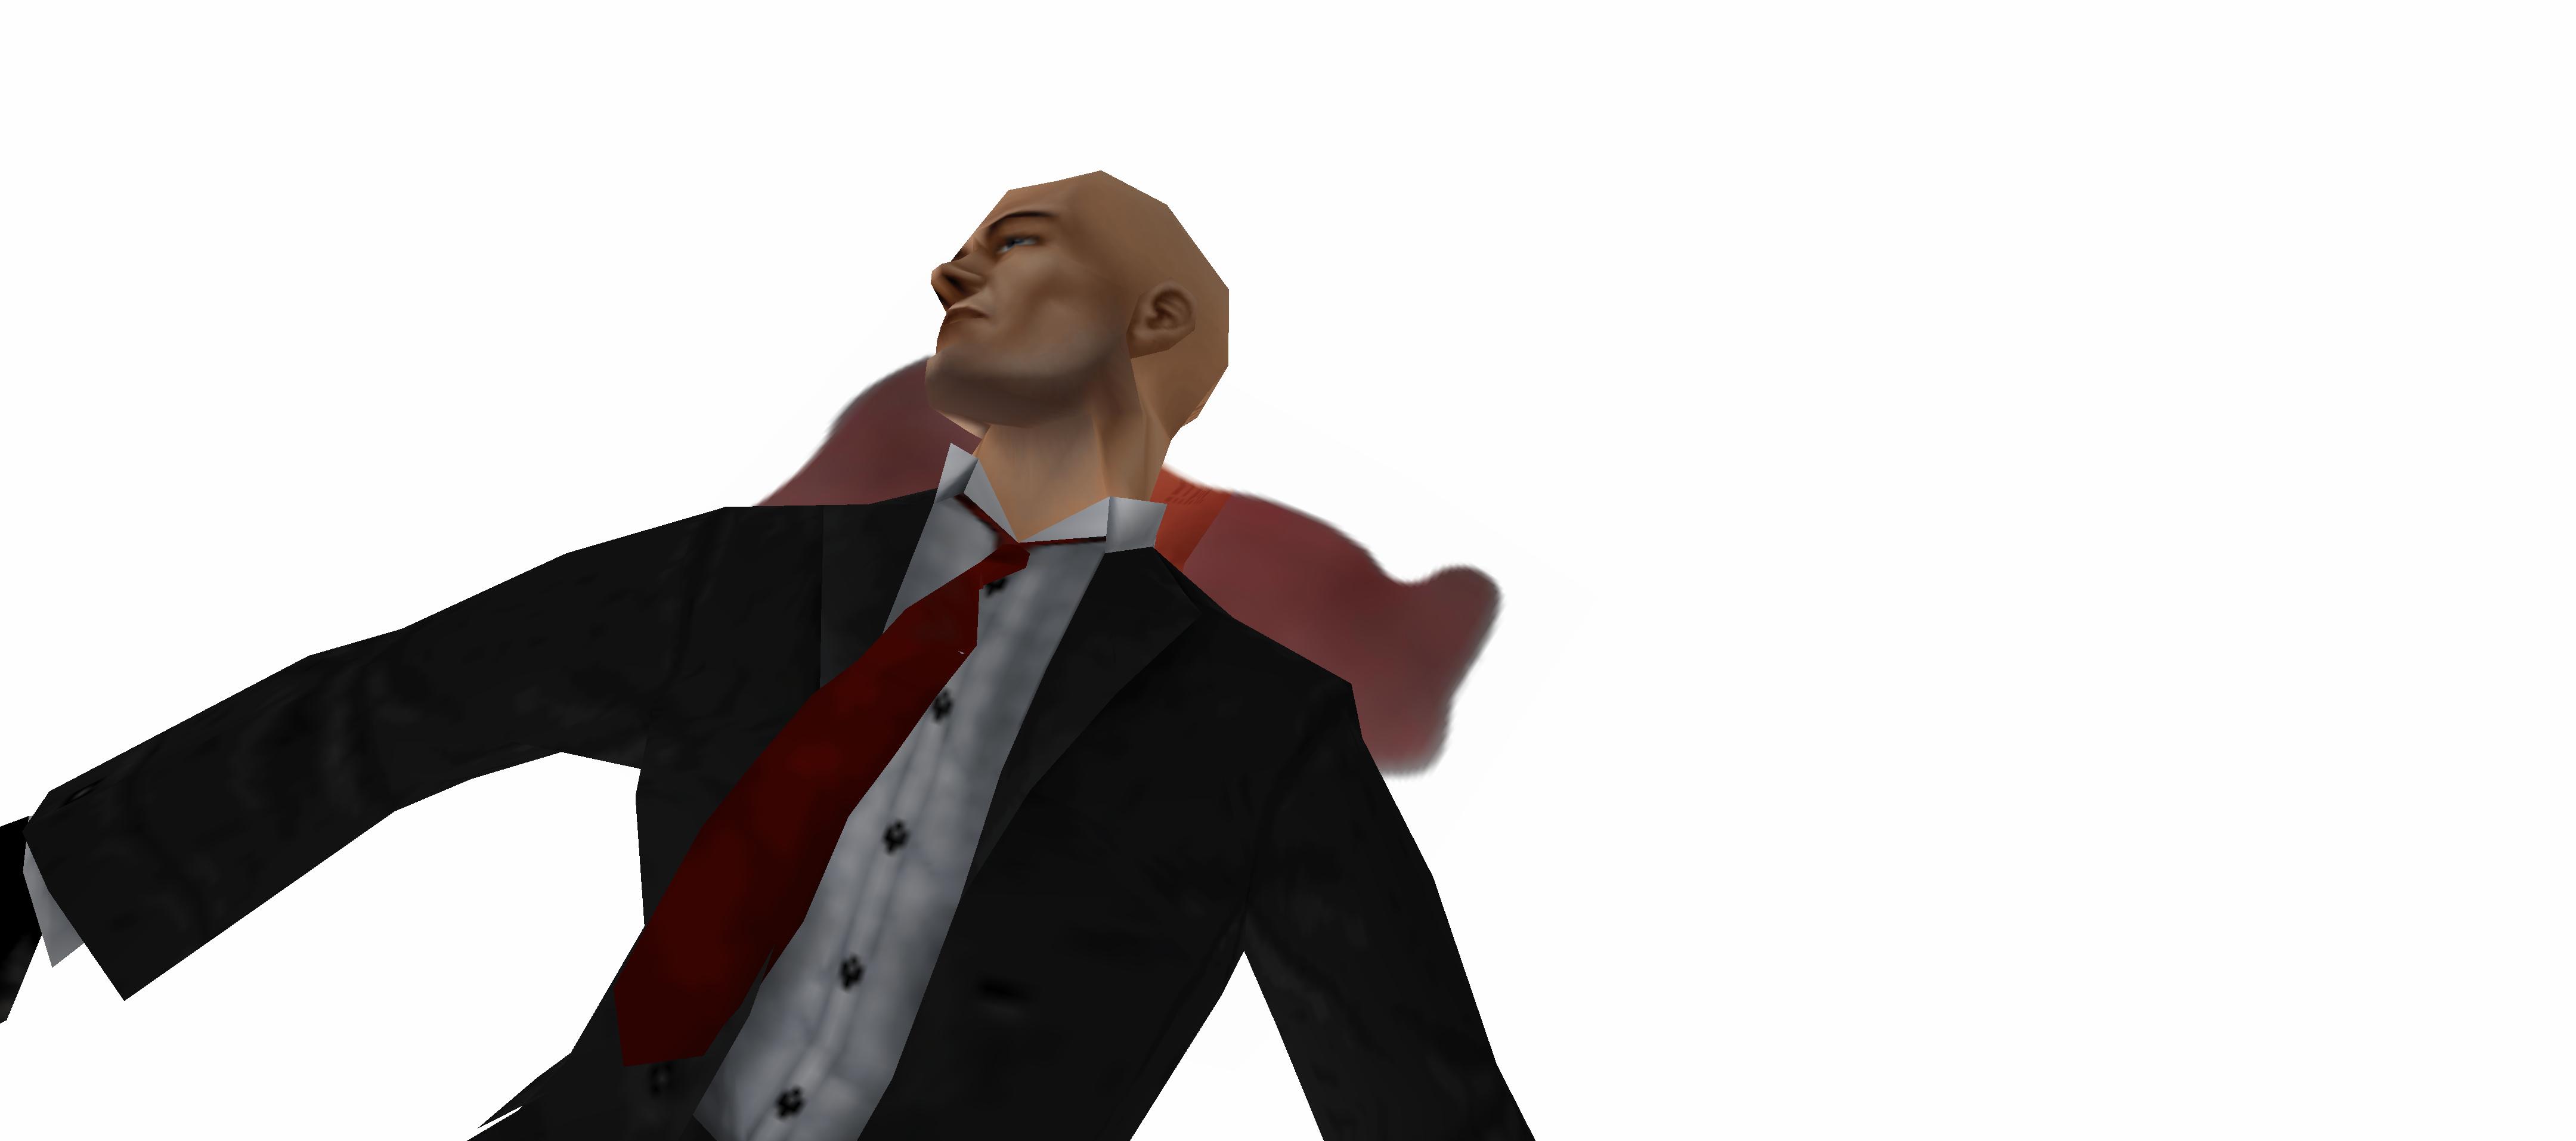 How to run Hitman: Codename 47 on Windows 7/8 | PC Gamer